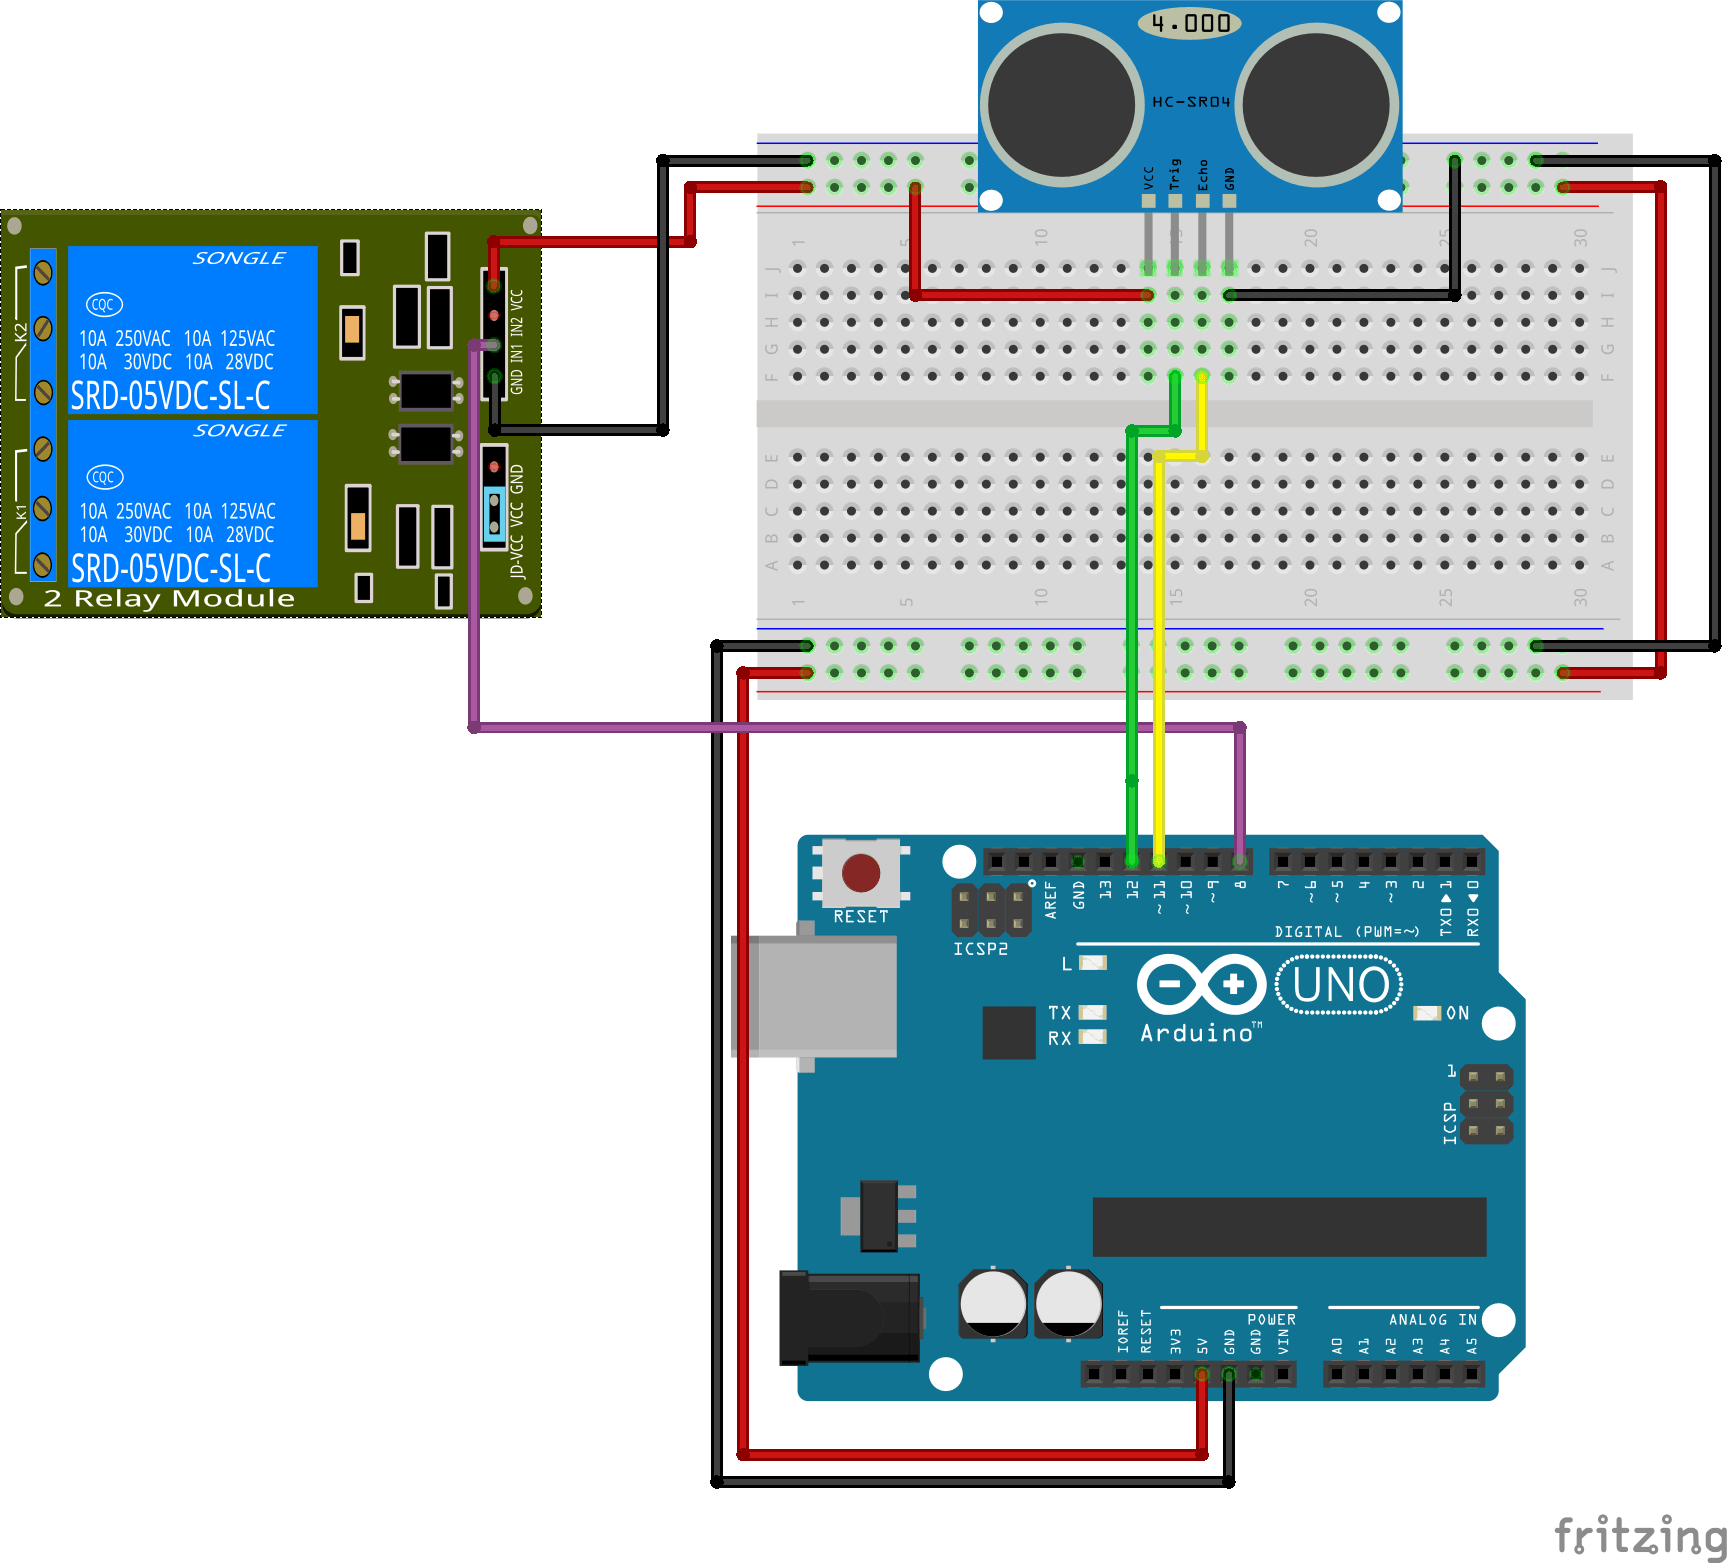 leviton ceiling occupancy sensor wiring diagram leviton photo sensor wiring diagram watt stopper ls 102 [ 1728 x 1563 Pixel ]